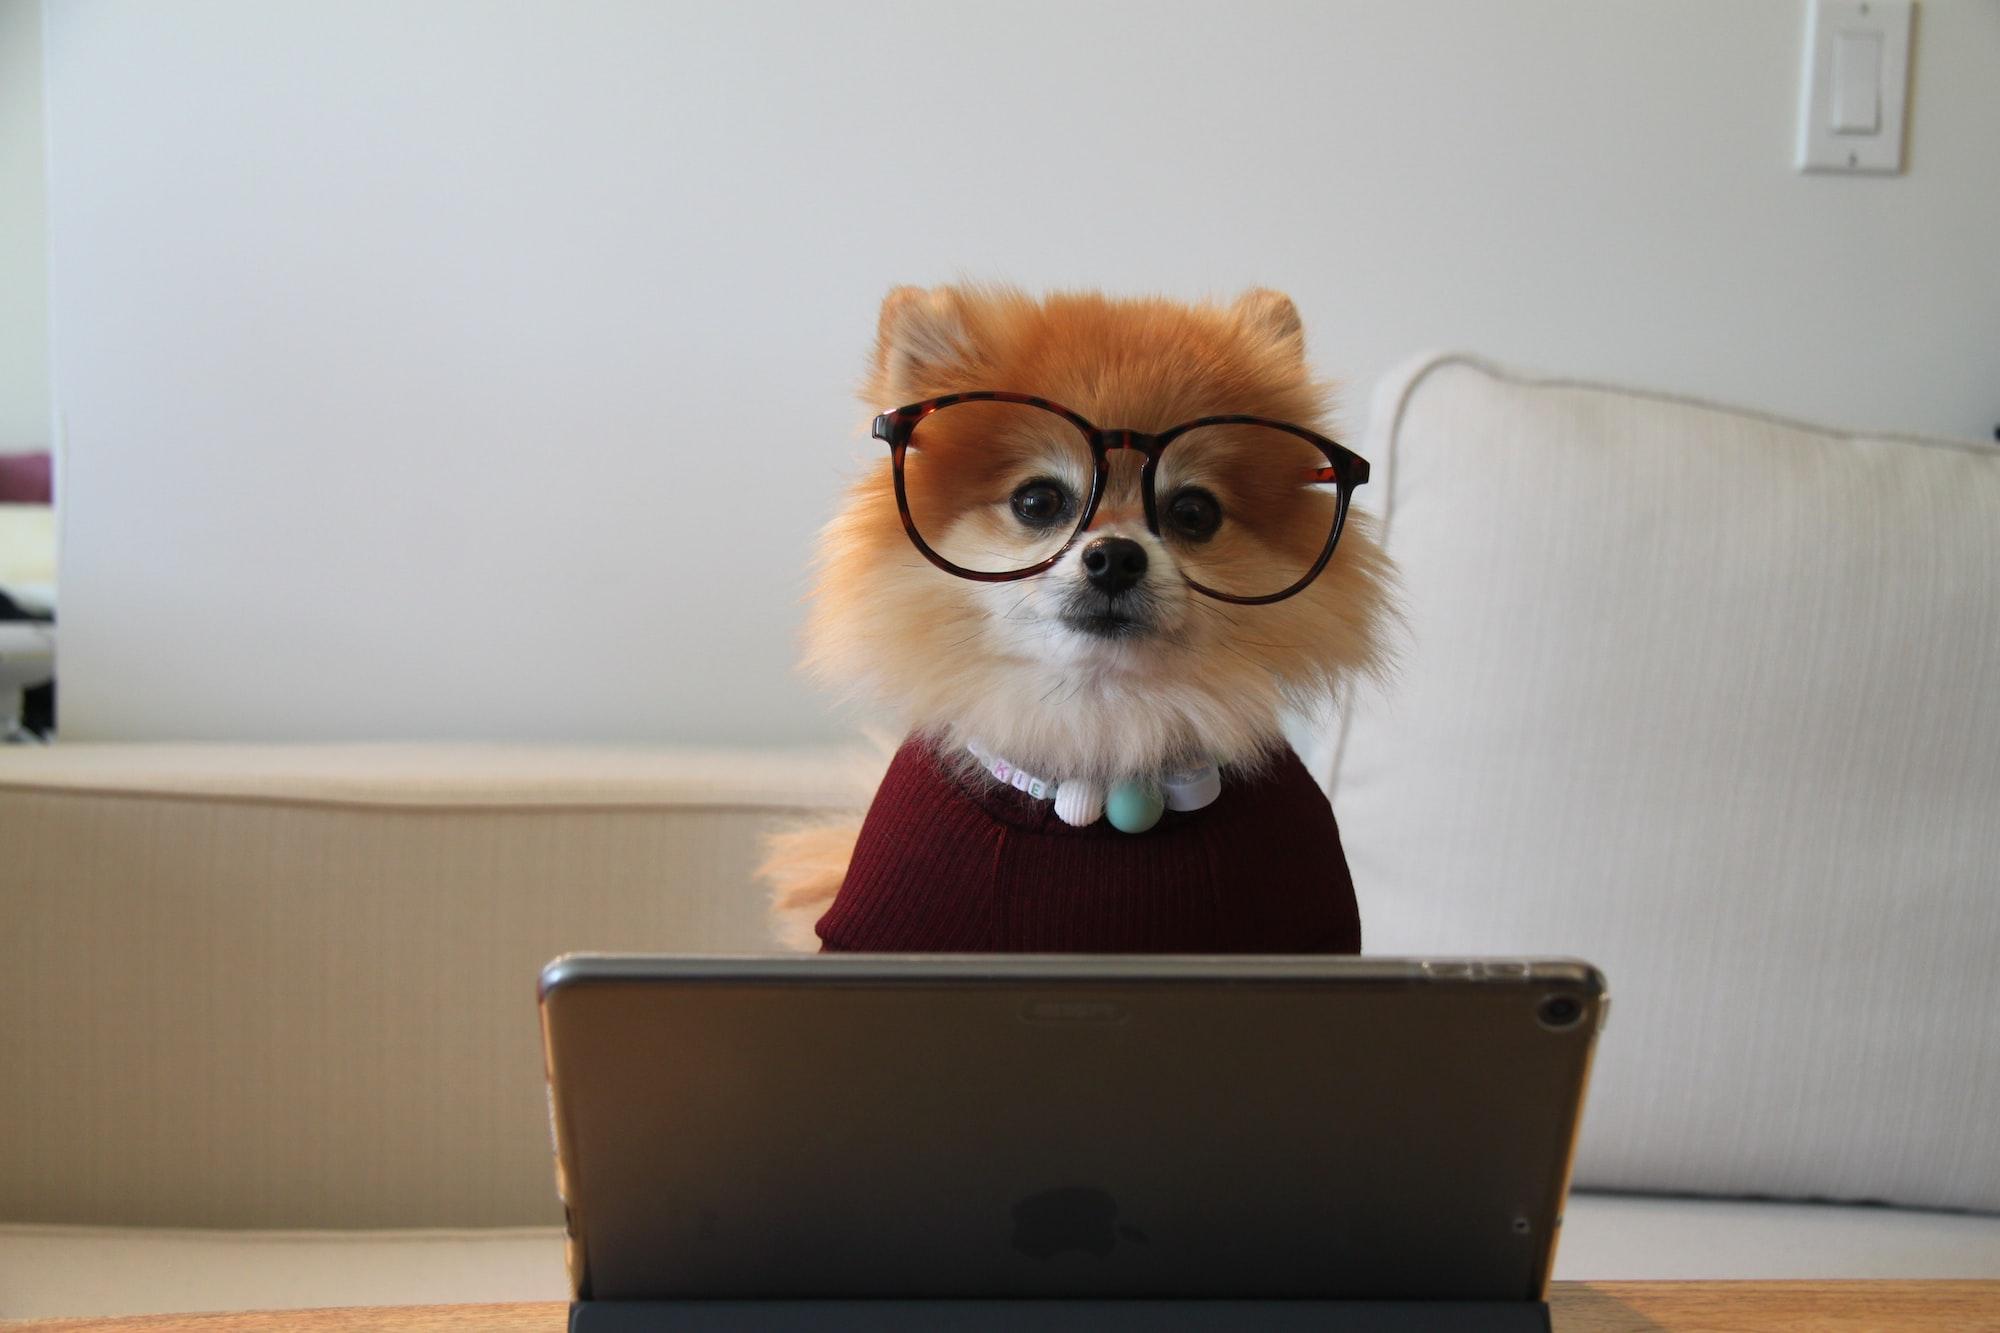 Pomeranian working on an iPad